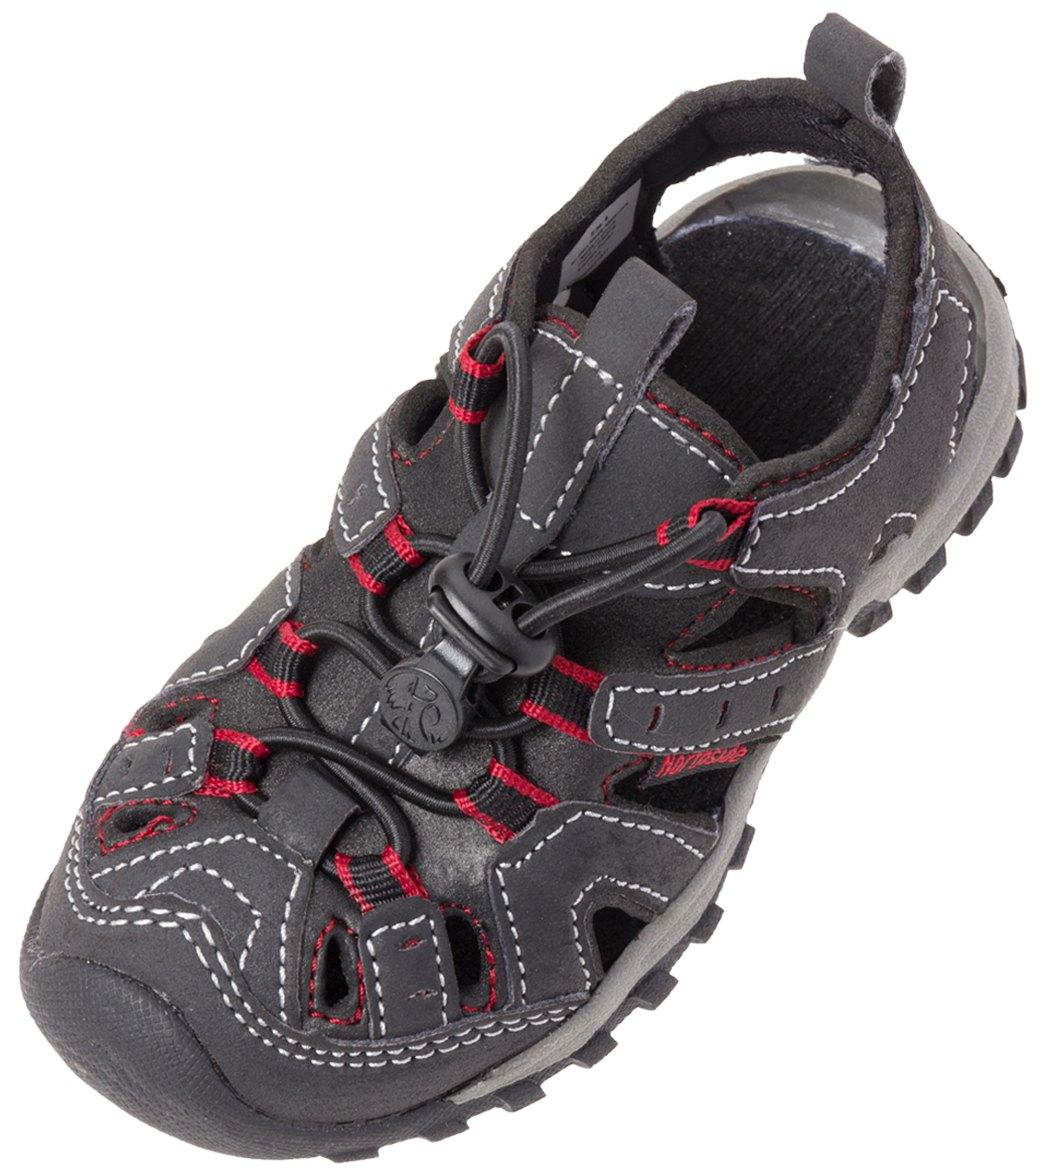 4524b04ec94b Northside Toddler Boys  Burke II Water Shoes at SwimOutlet.com